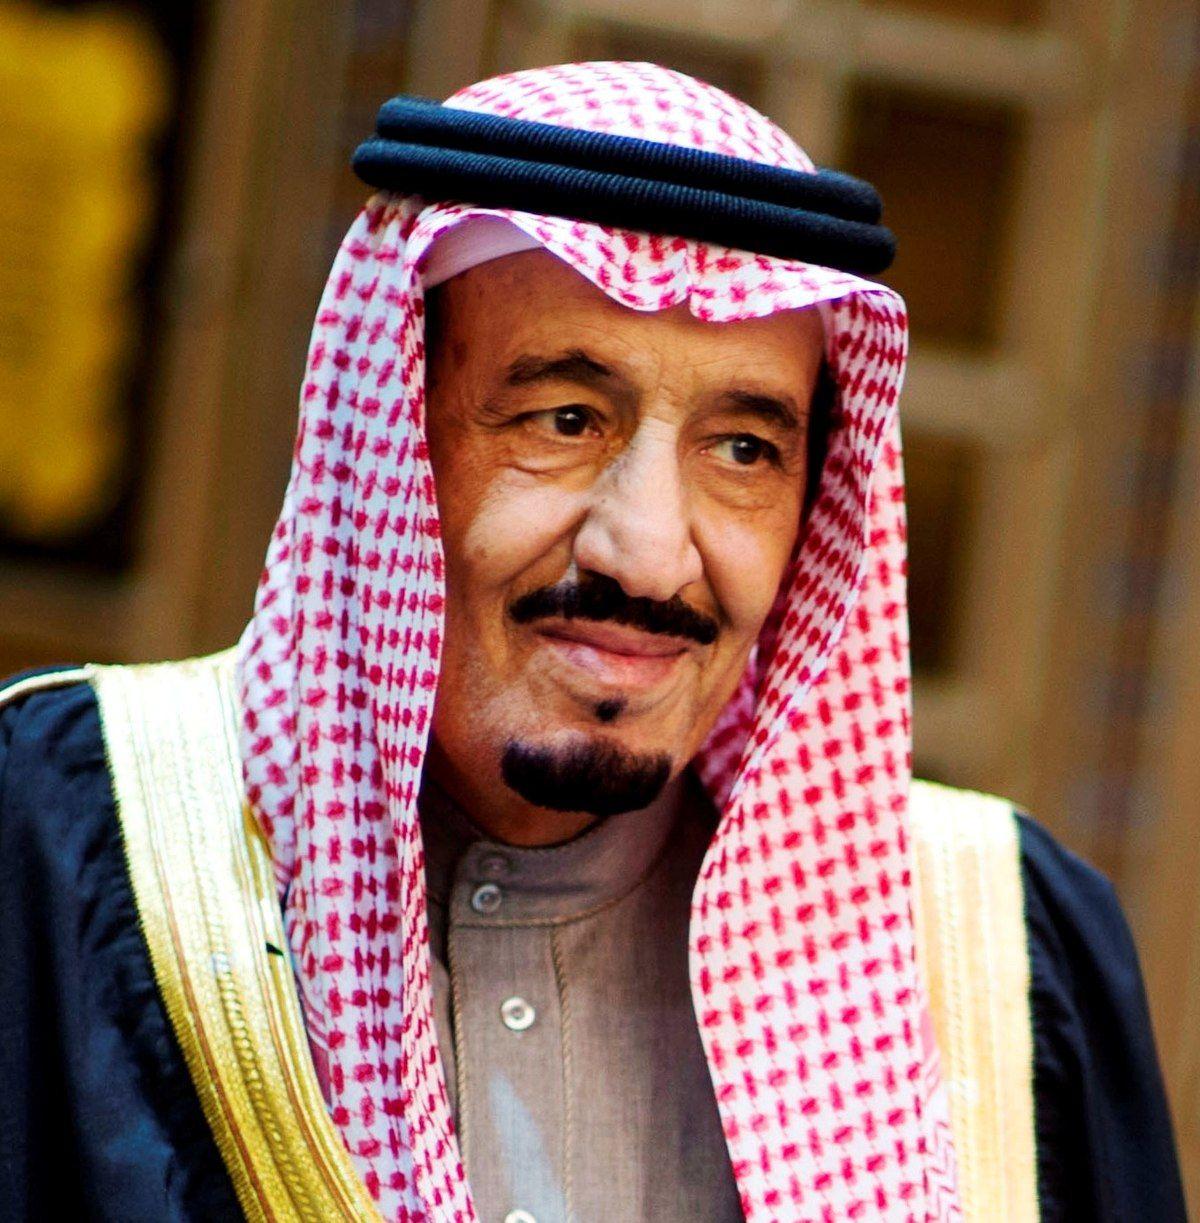 Salman Bin Abdulaziz Wikipedia La Enciclopedia Libre Salman Of Saudi Arabia Saudi Arabia Hotels In Turkey